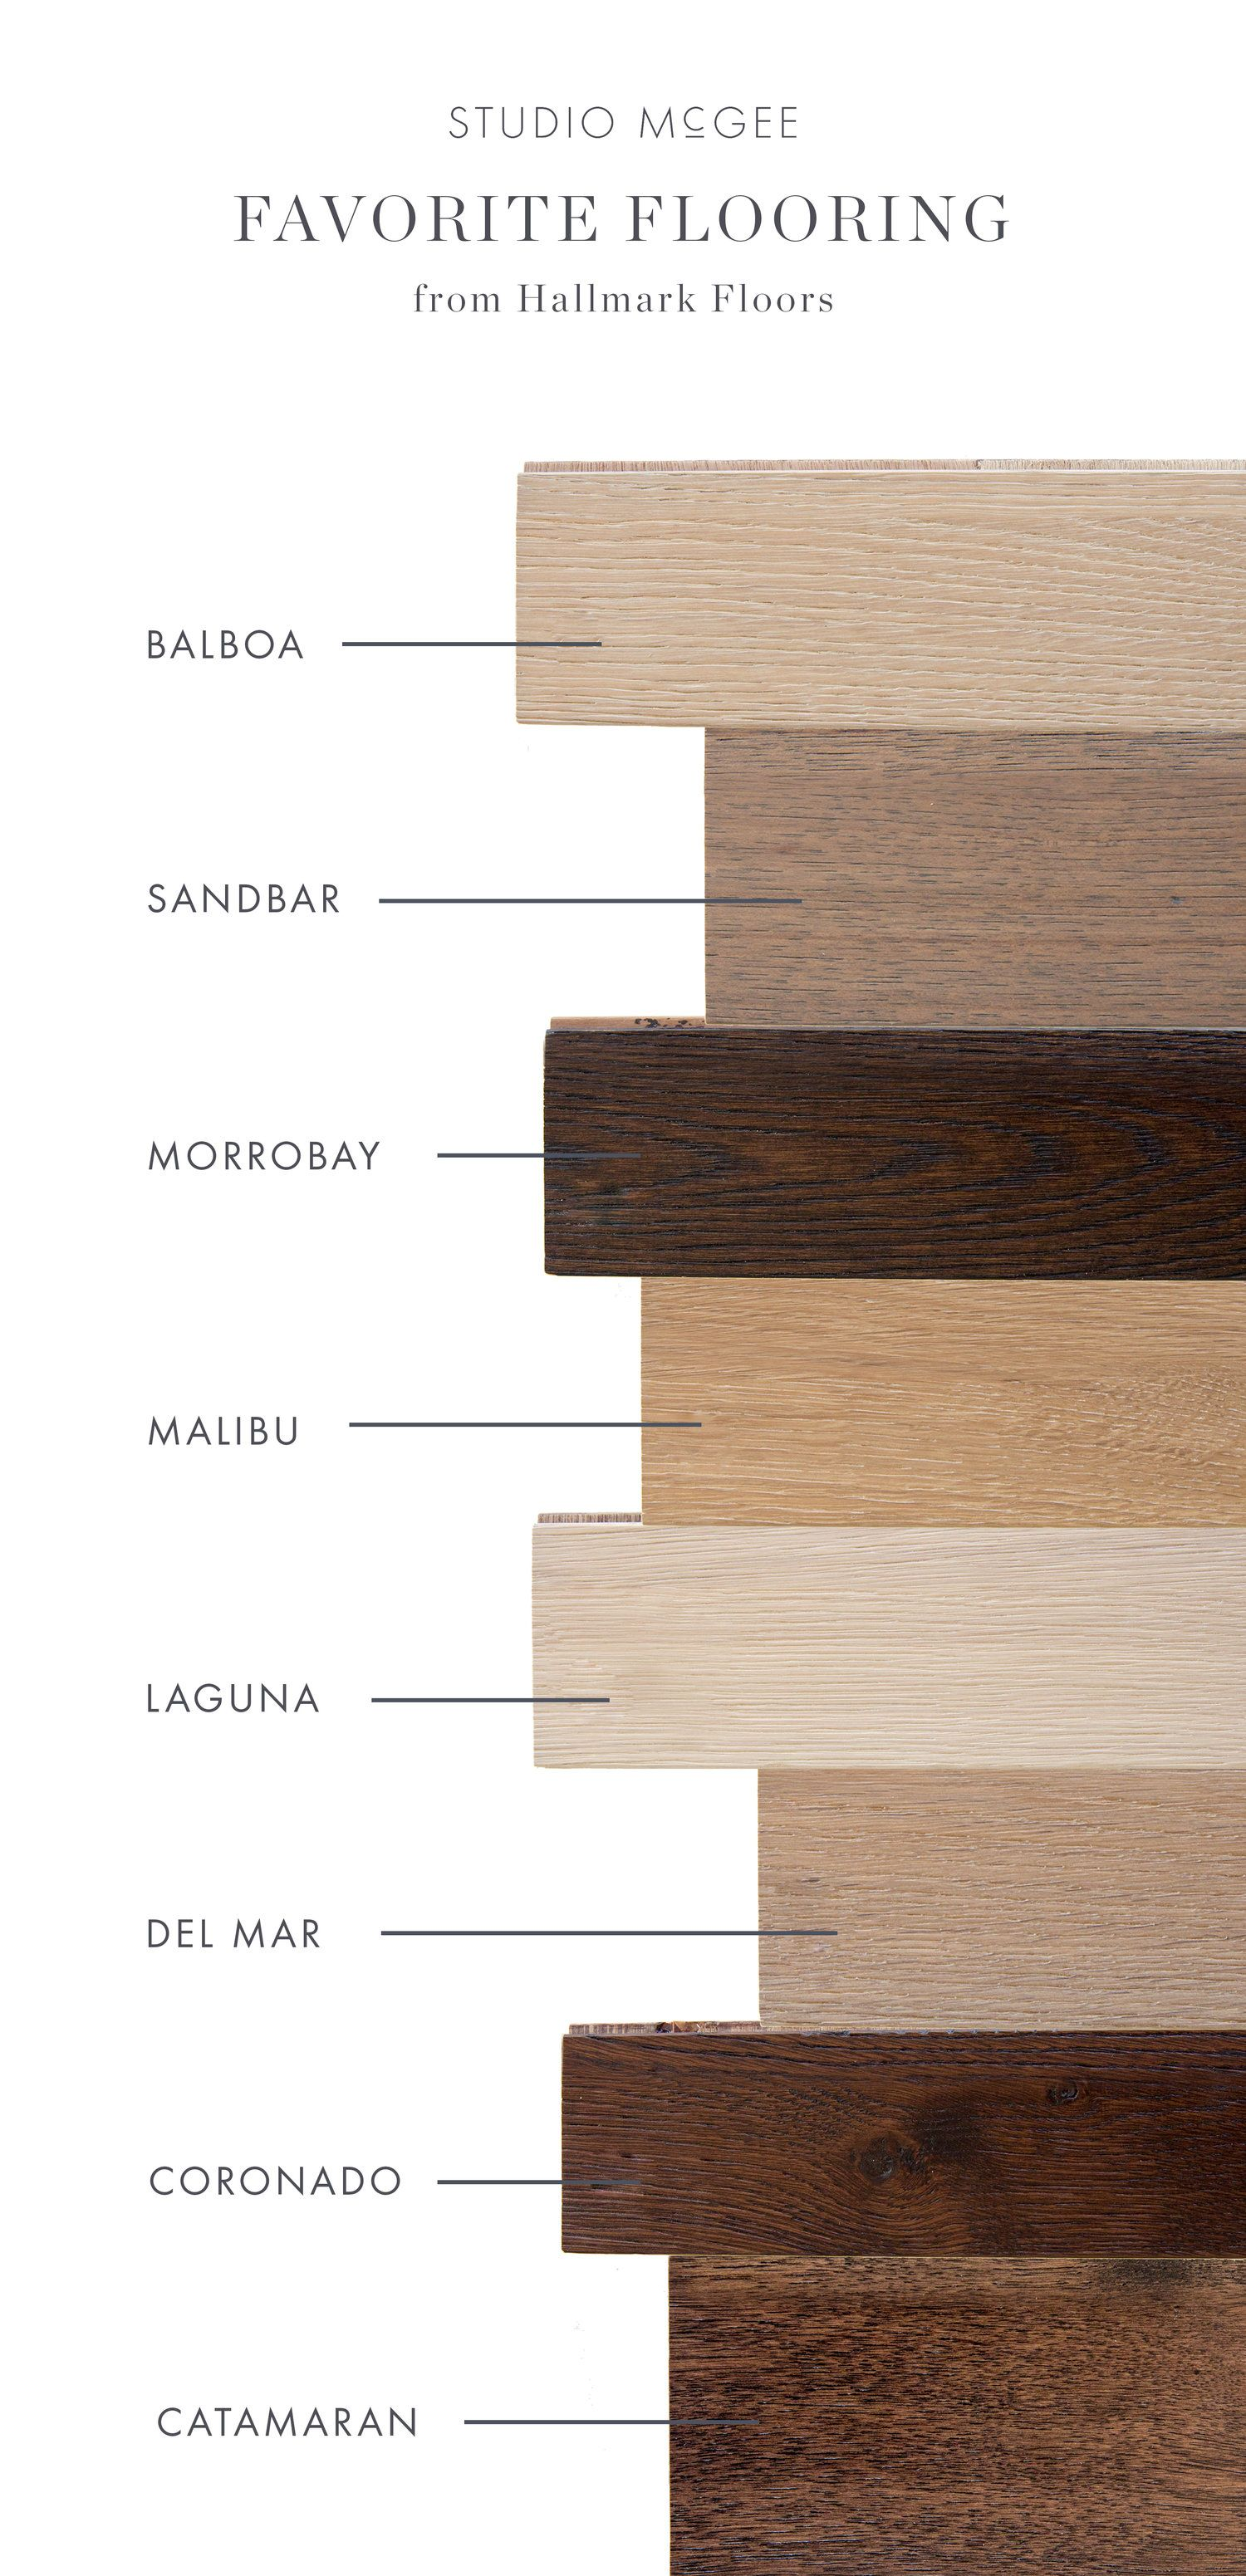 Studio McGee Guide to Flooring with Hallmark Floors